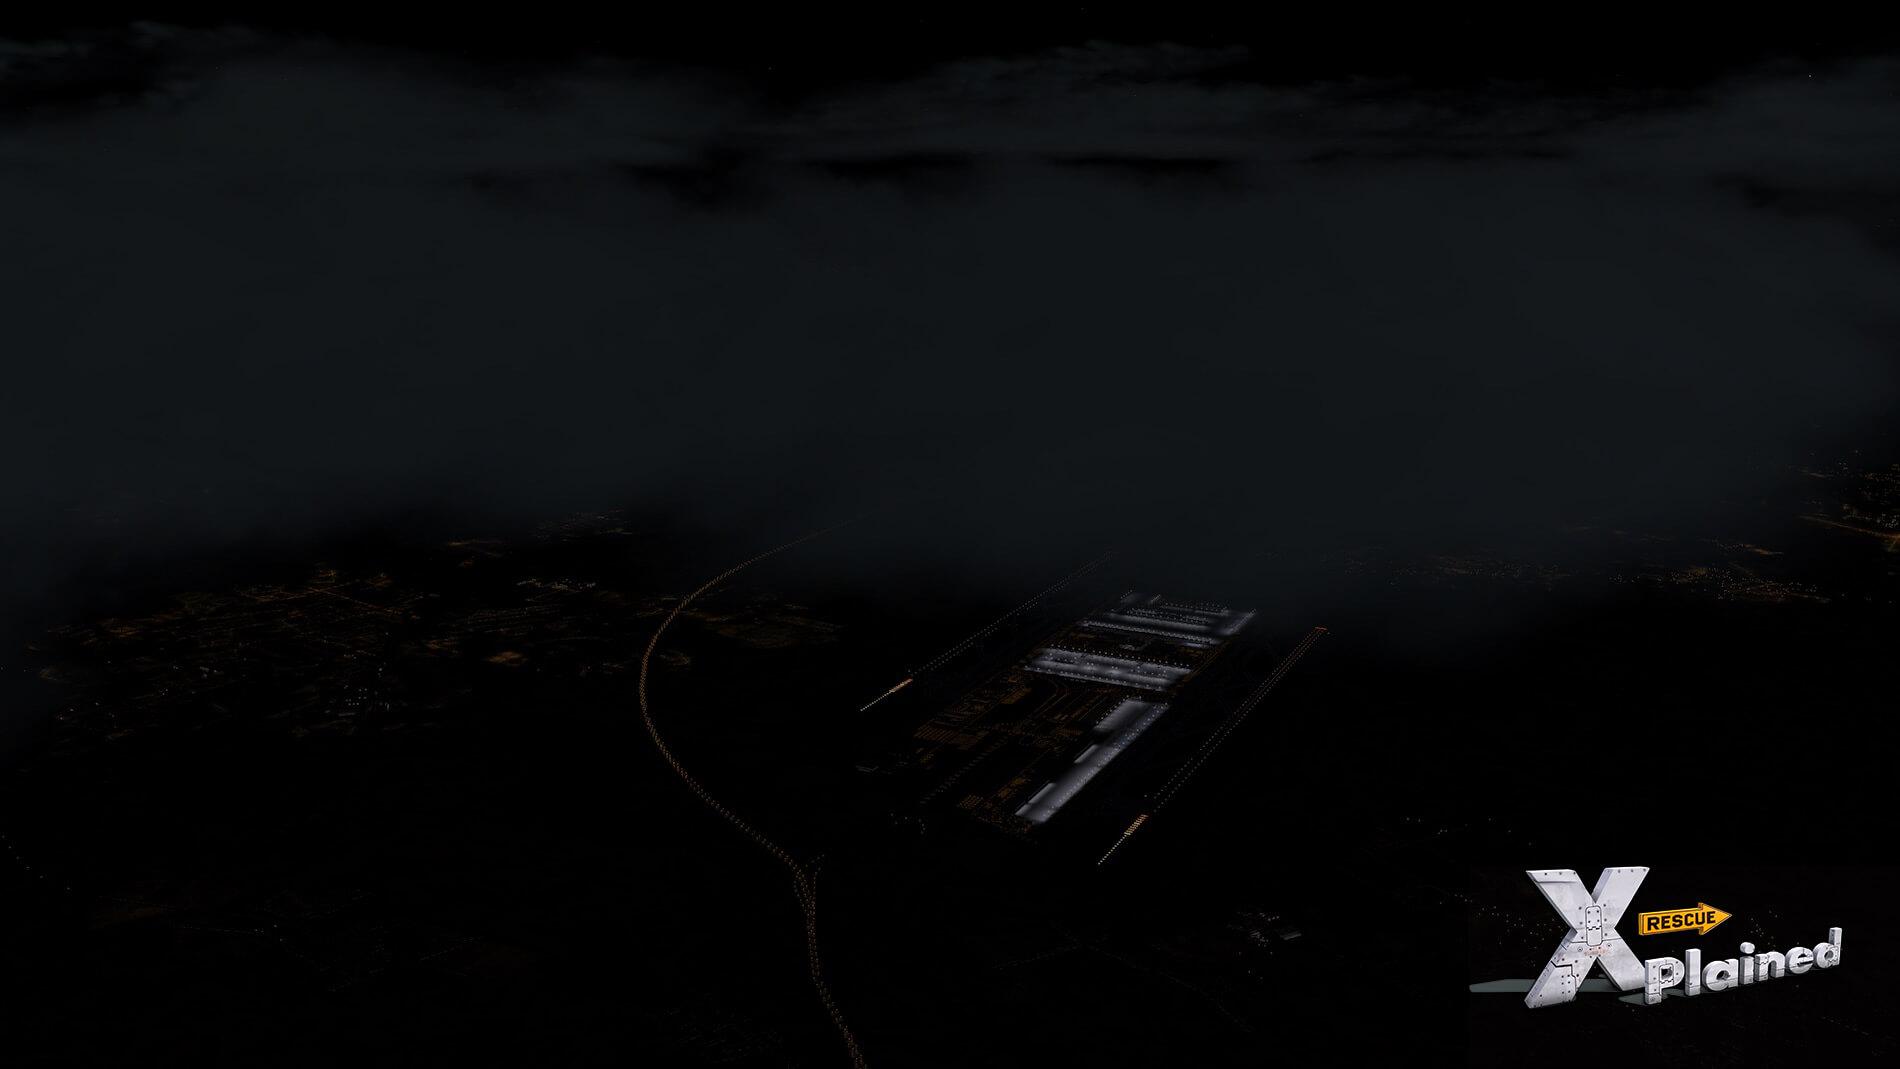 Evening-Impression-SFD-EDDM-20